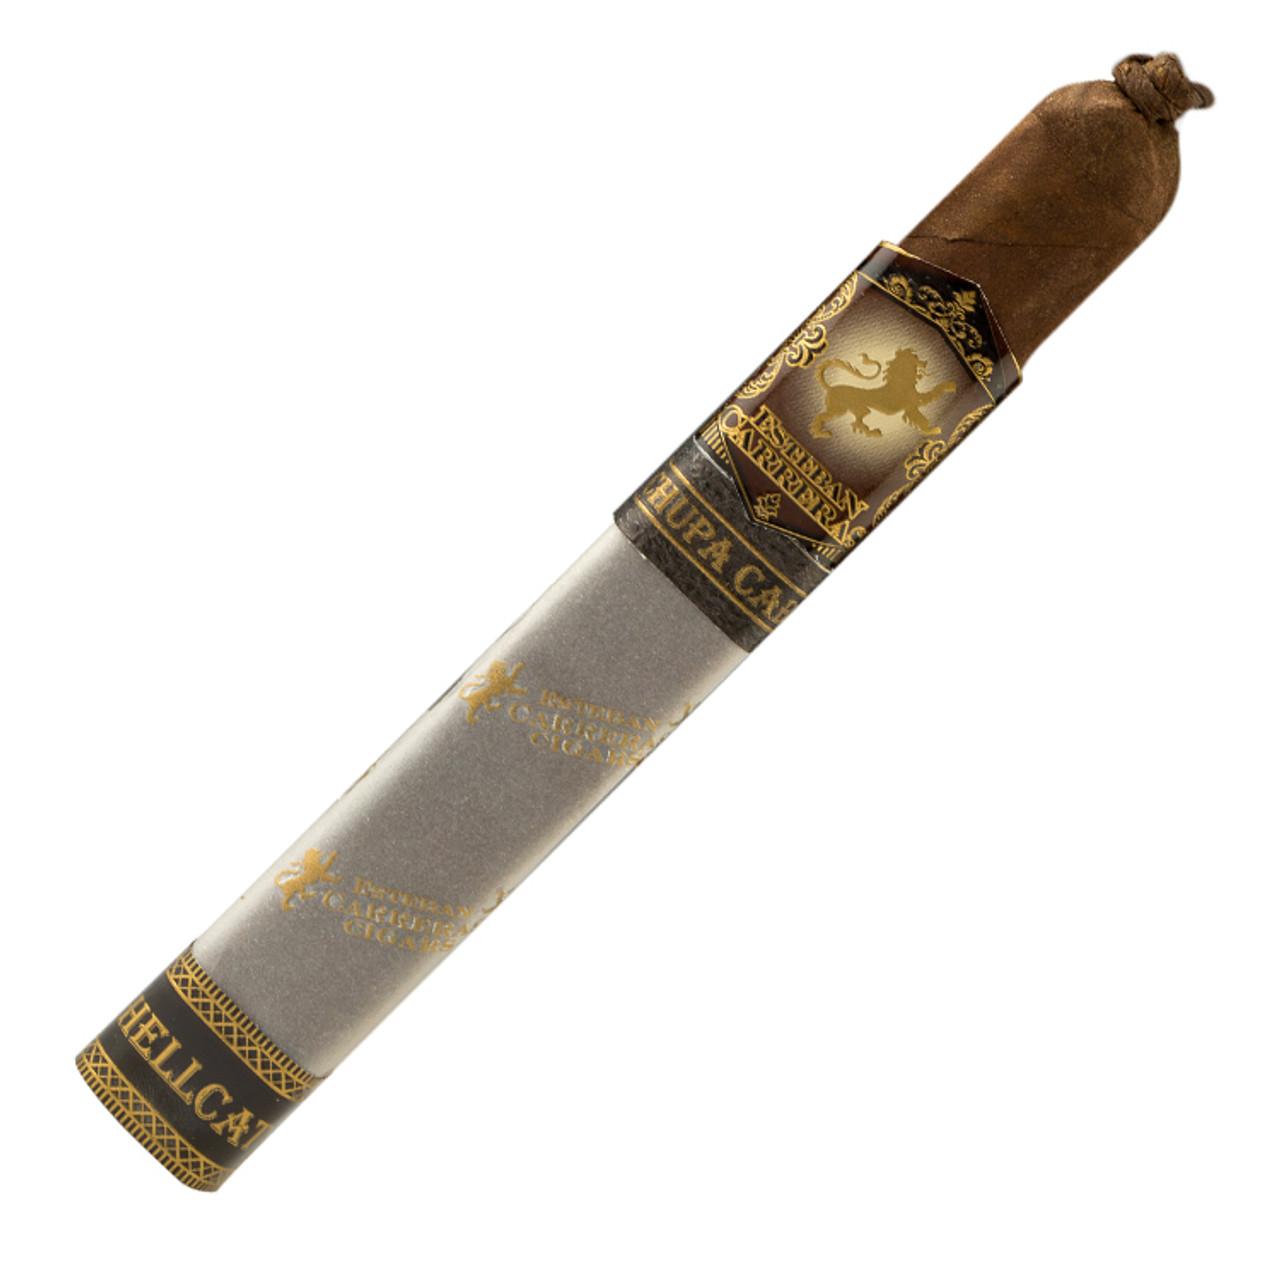 Esteban Carreras Chupacabra Hellcat Toro Grande Cigars - 6.5 x 54 (Box of 20)